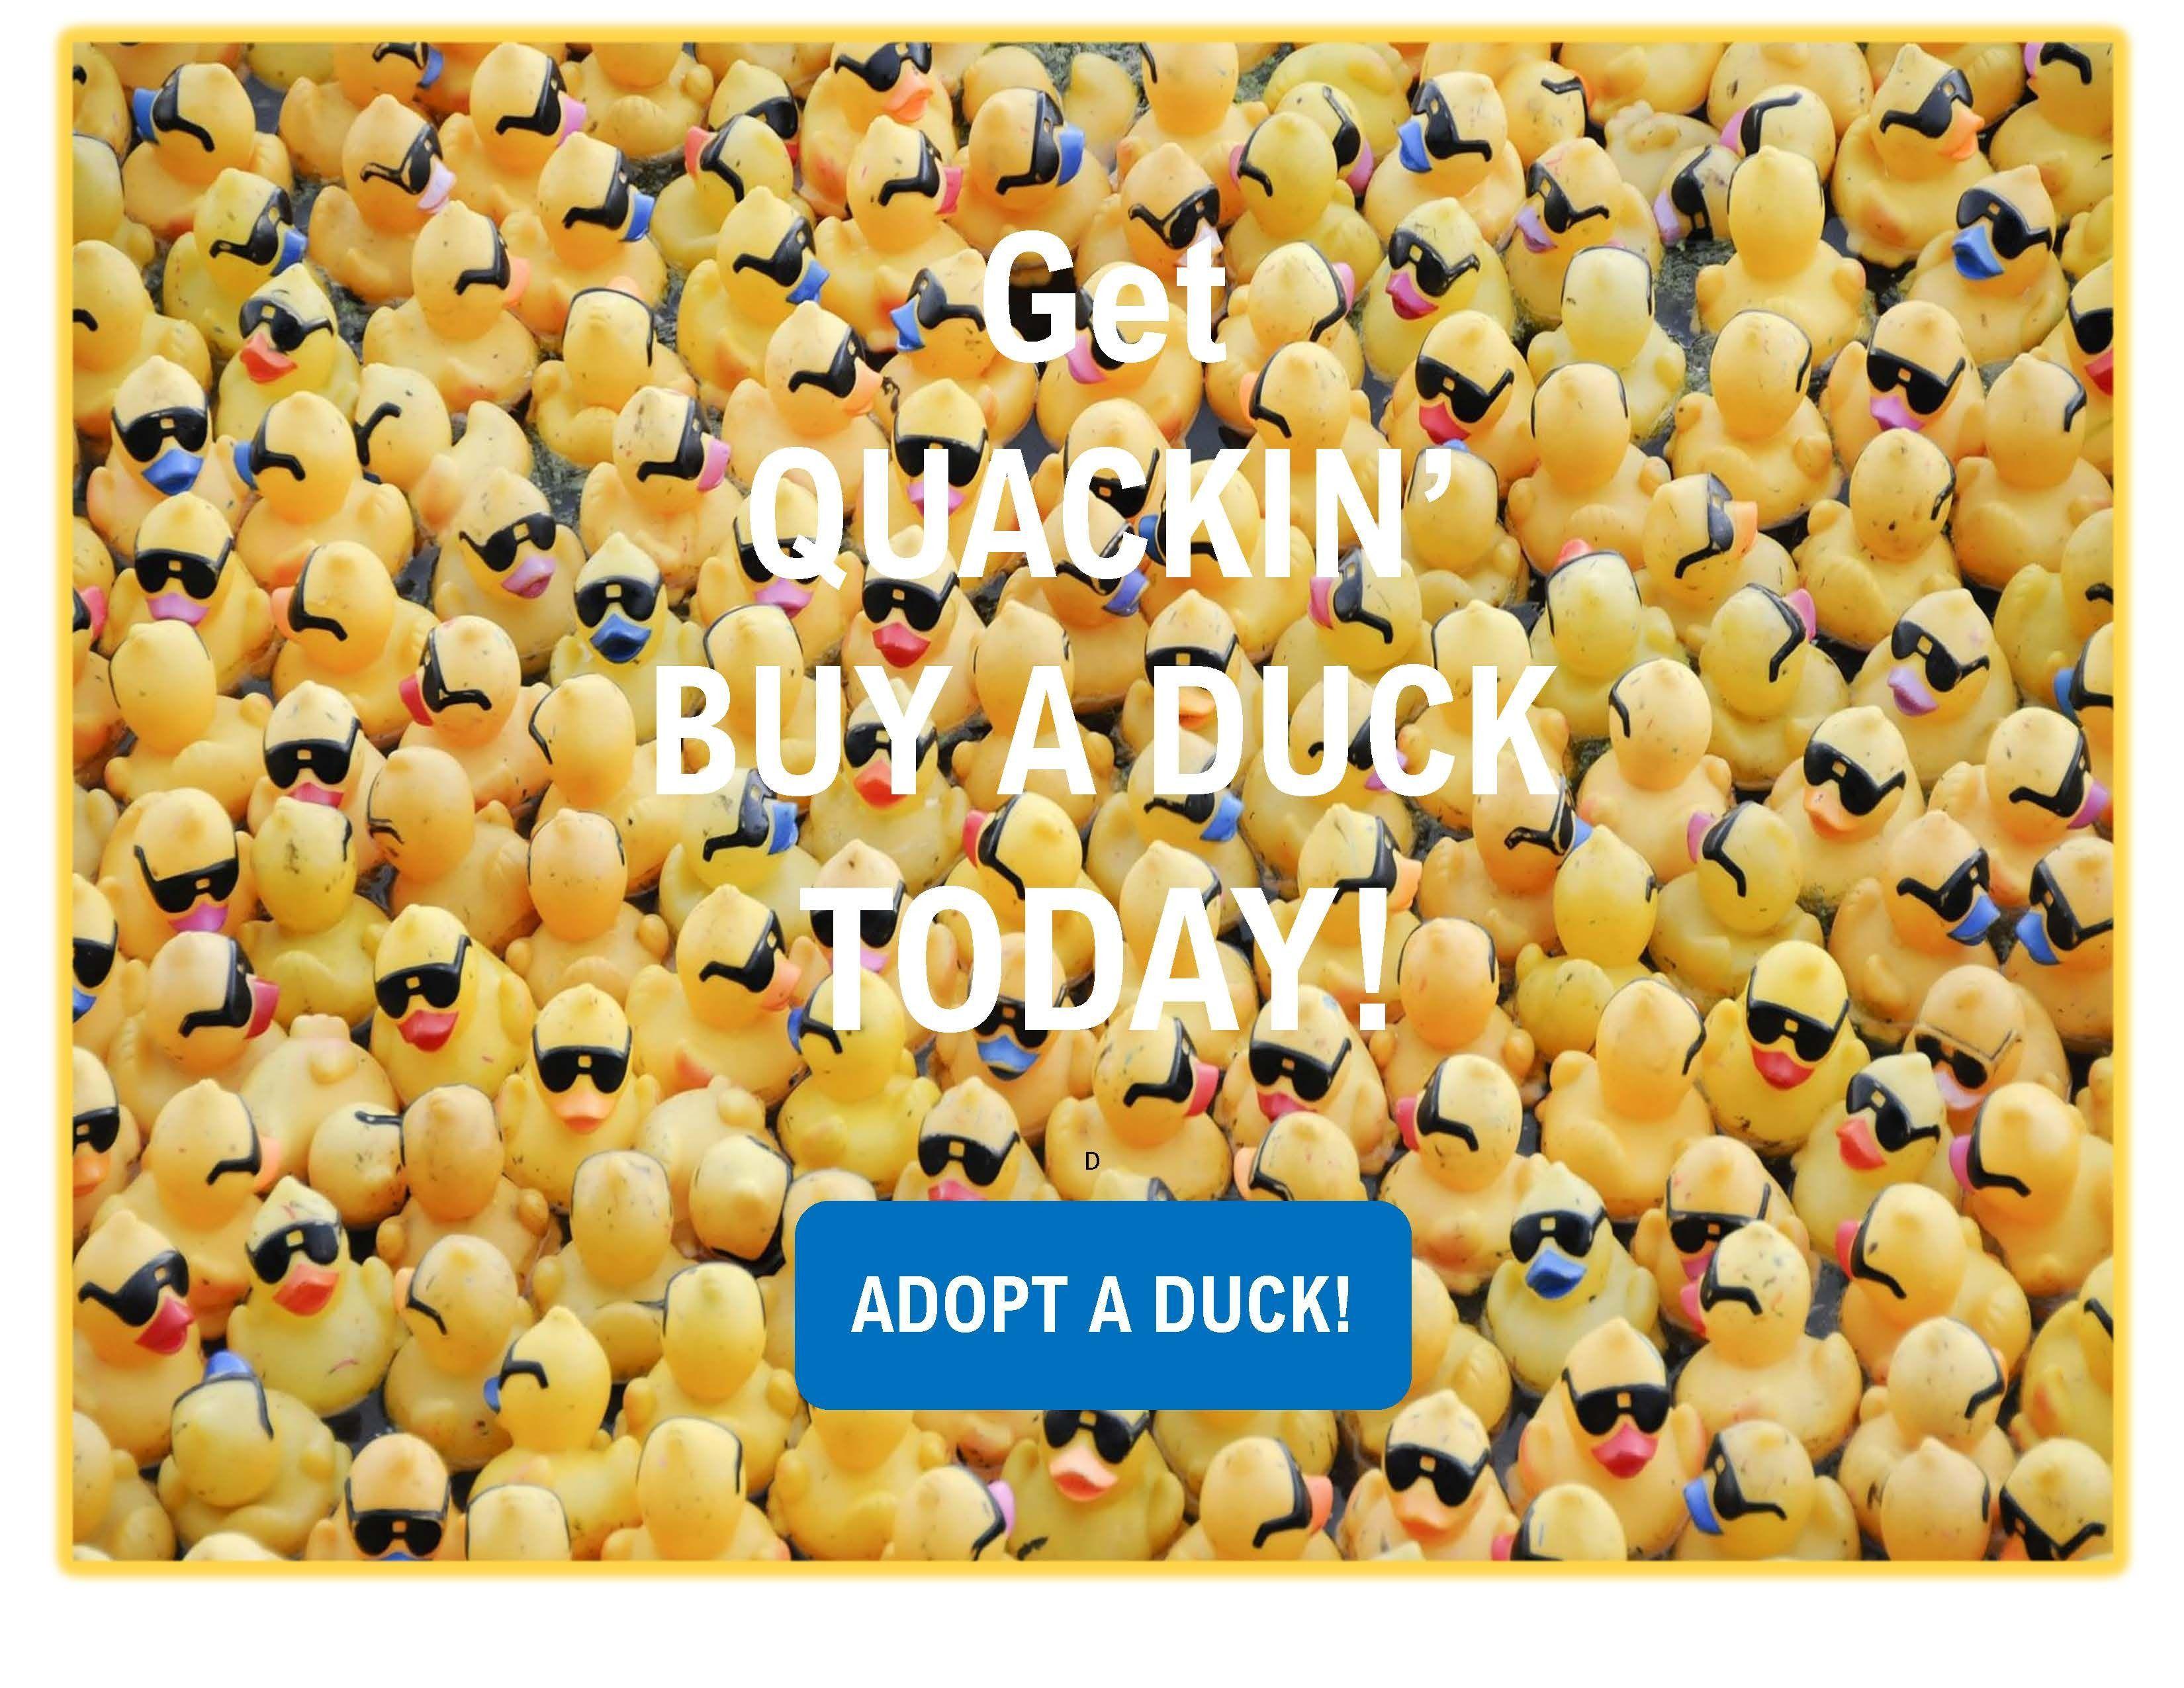 Get Quackin & Adopt a Duck!